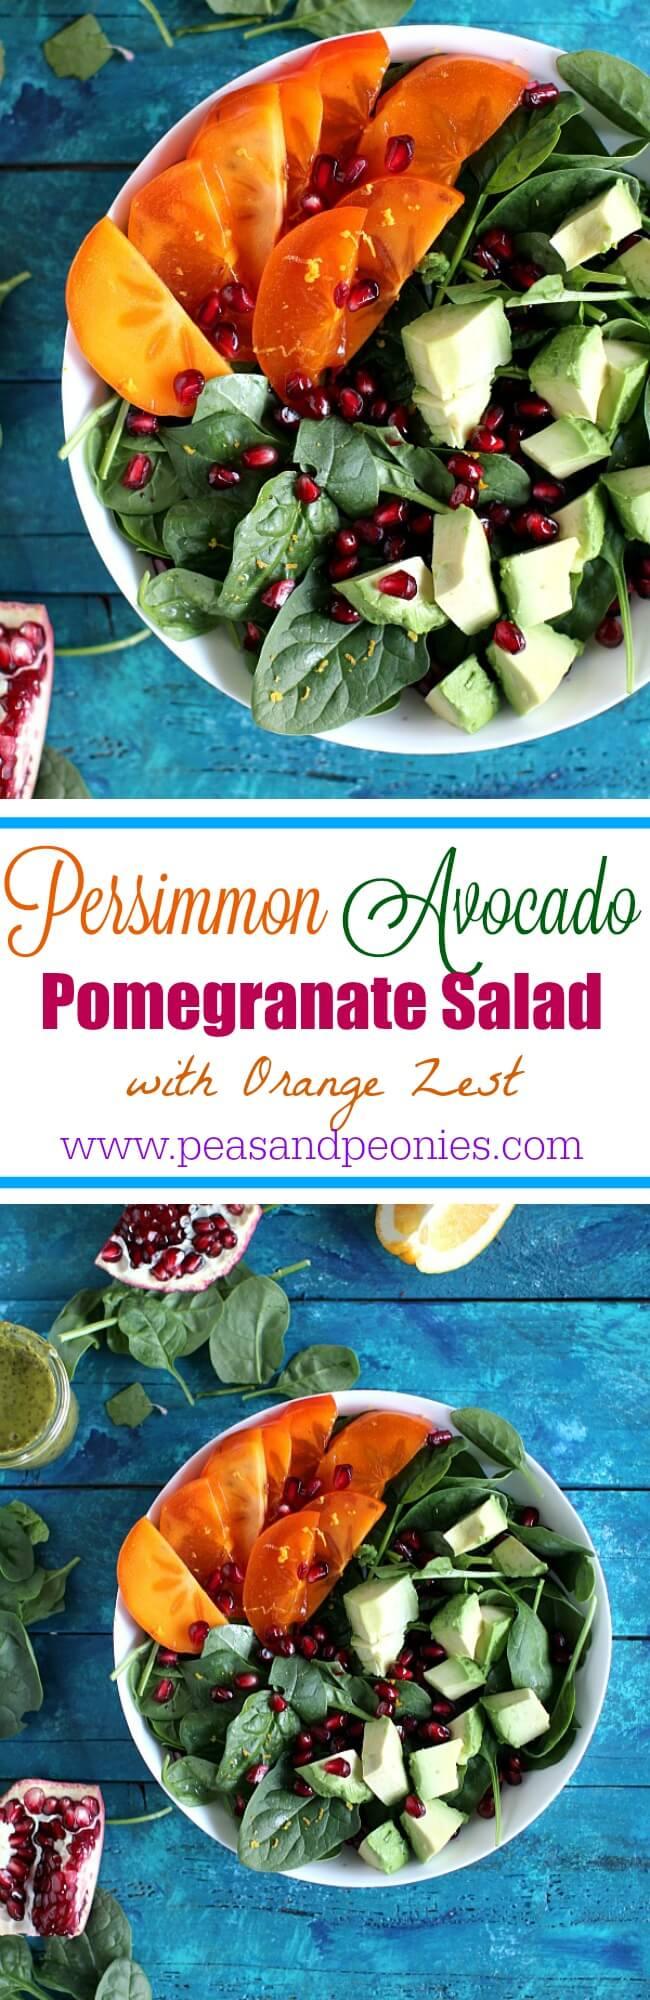 Persimmon Avocado Pomegranate Salad